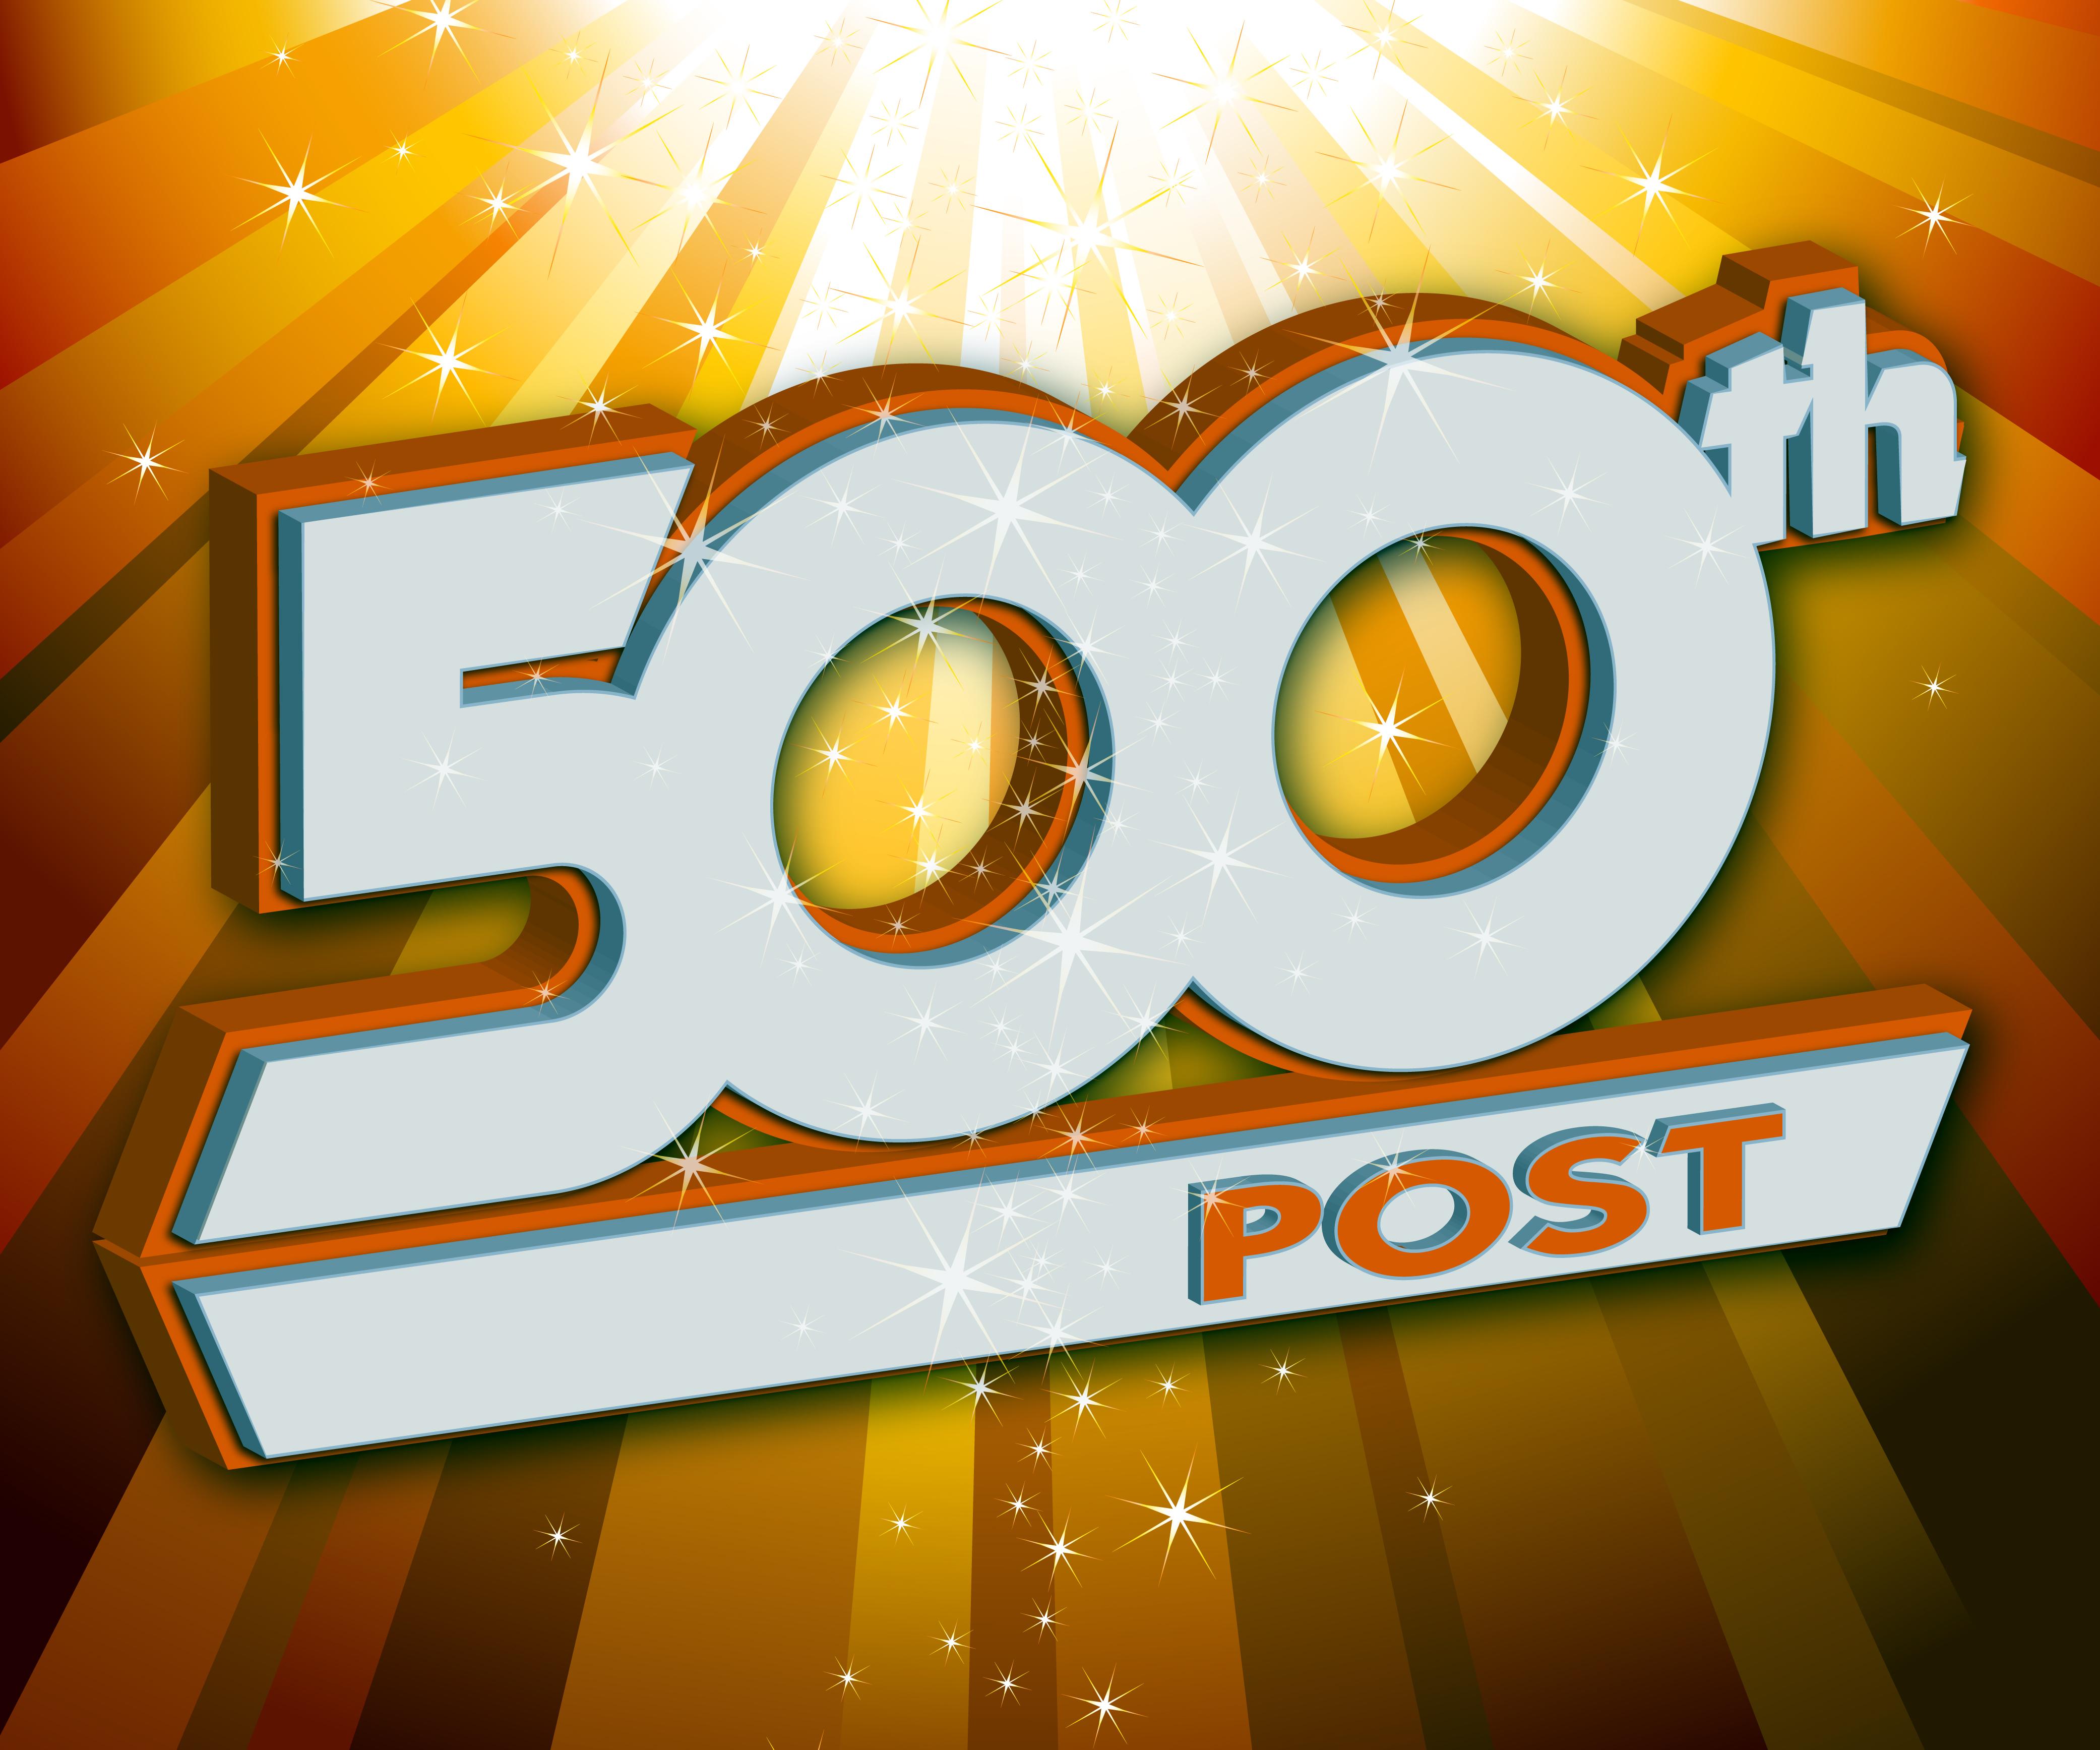 500th